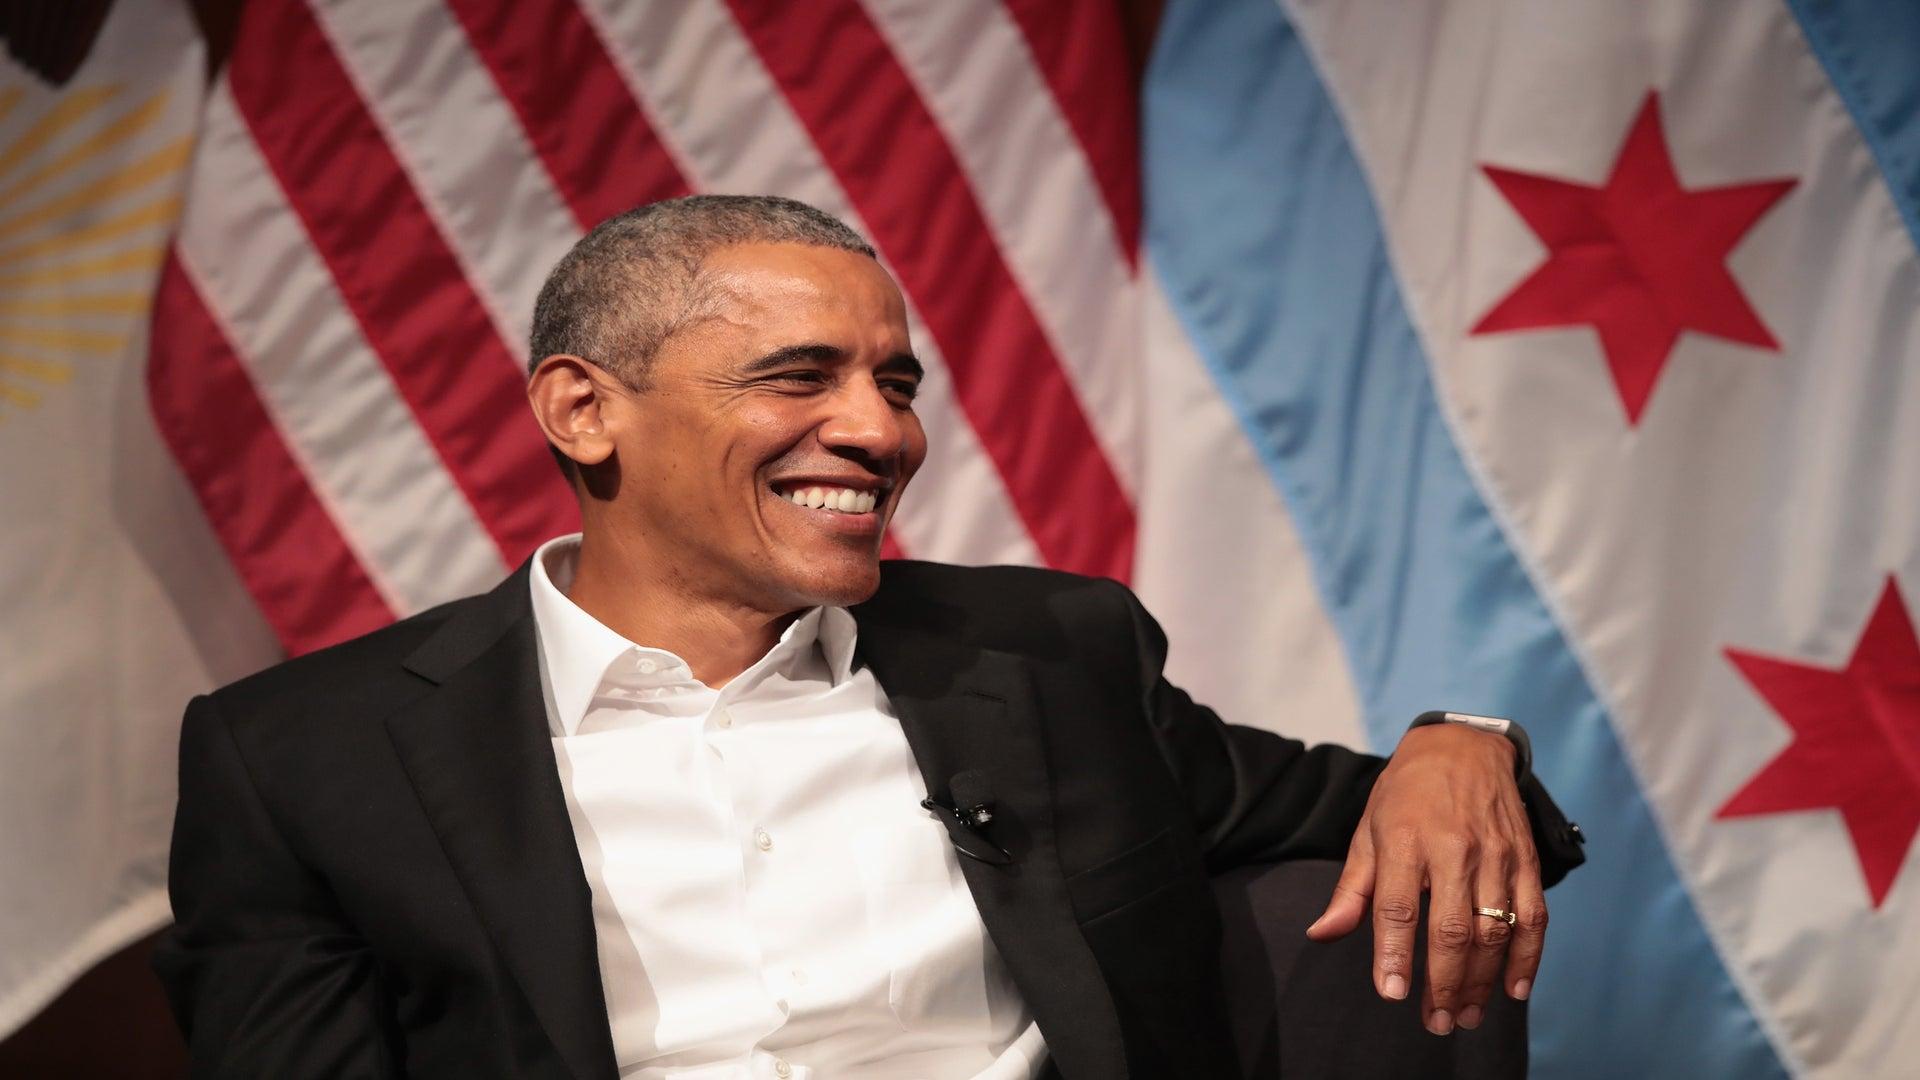 Barack Obama's Spokesperson Defends $400,000 Wall Street-Sponsored Speech